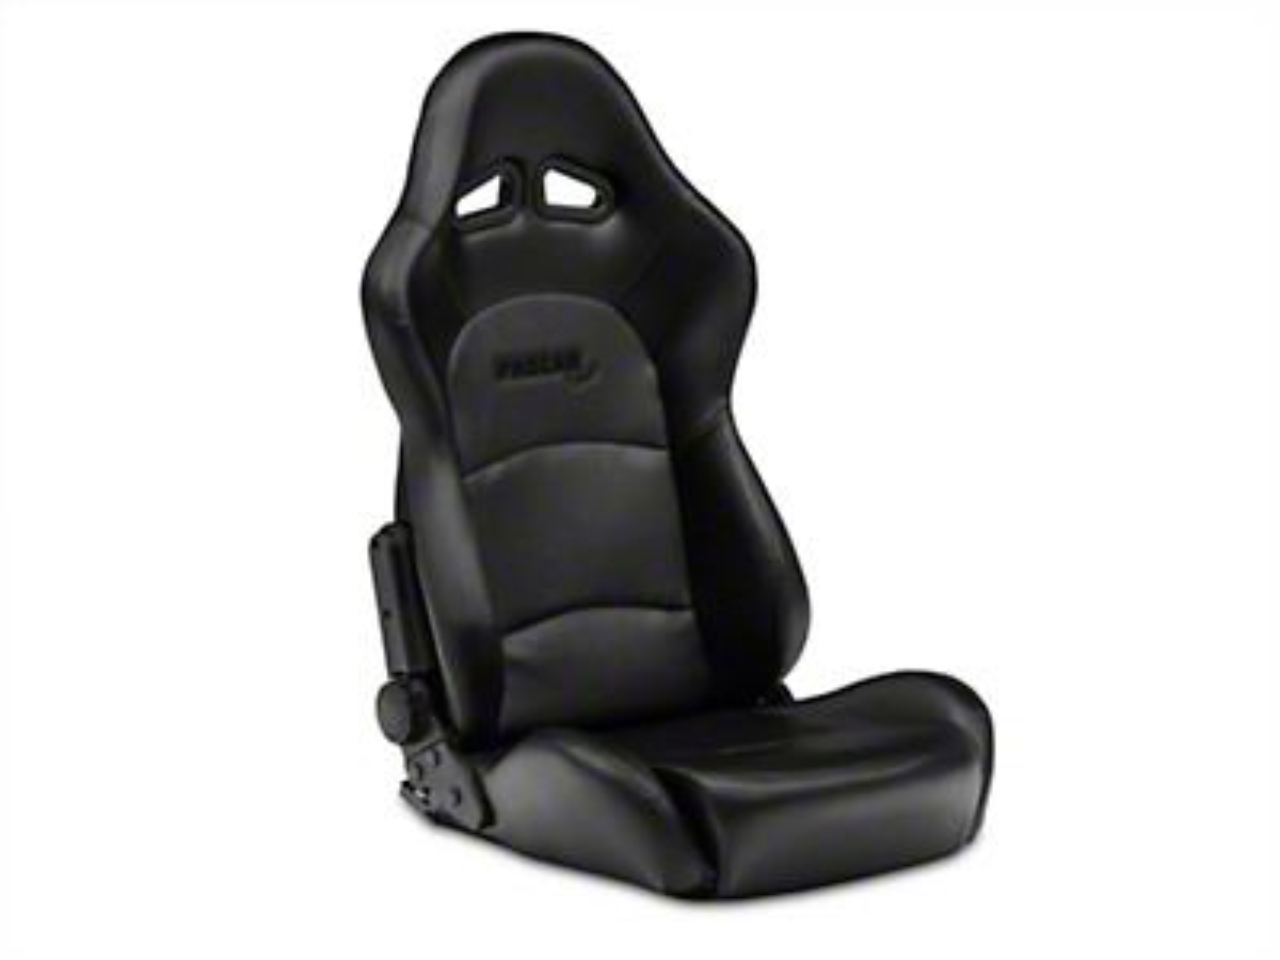 Procar Sportsman Pro Black Vinyl Reclining Seat - Universal (79-14 All)